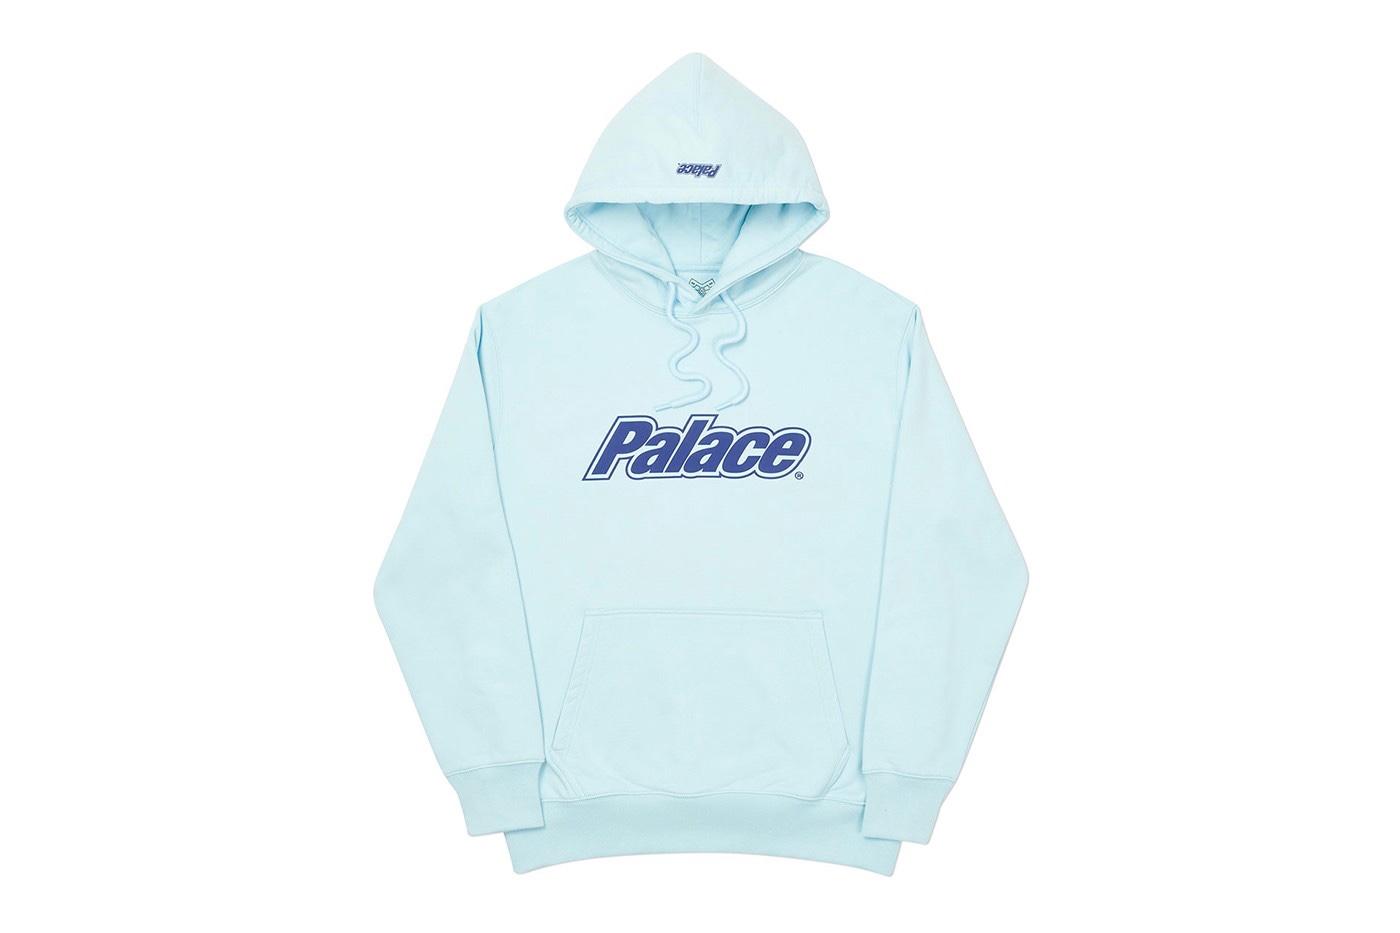 Palace Direct Hoodie